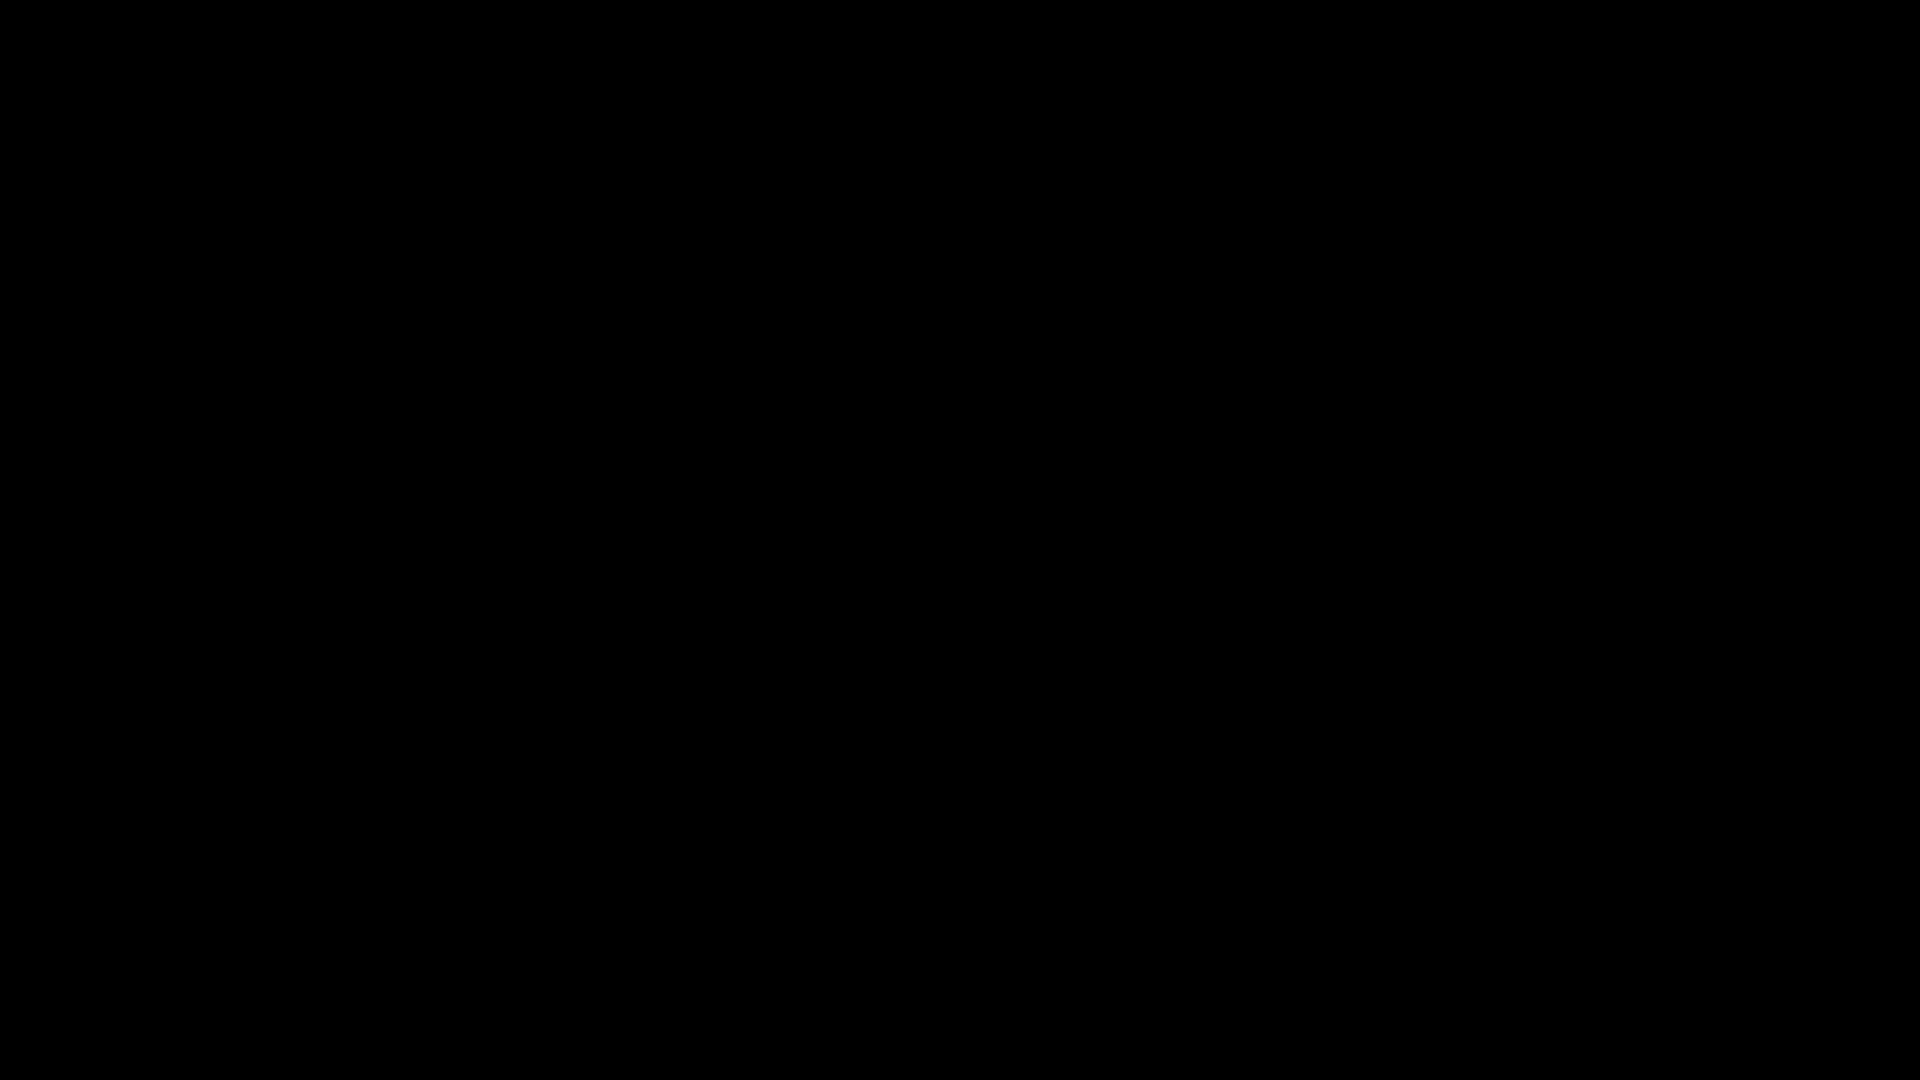 Kodi Wallpaper 1080p kodi animation thread